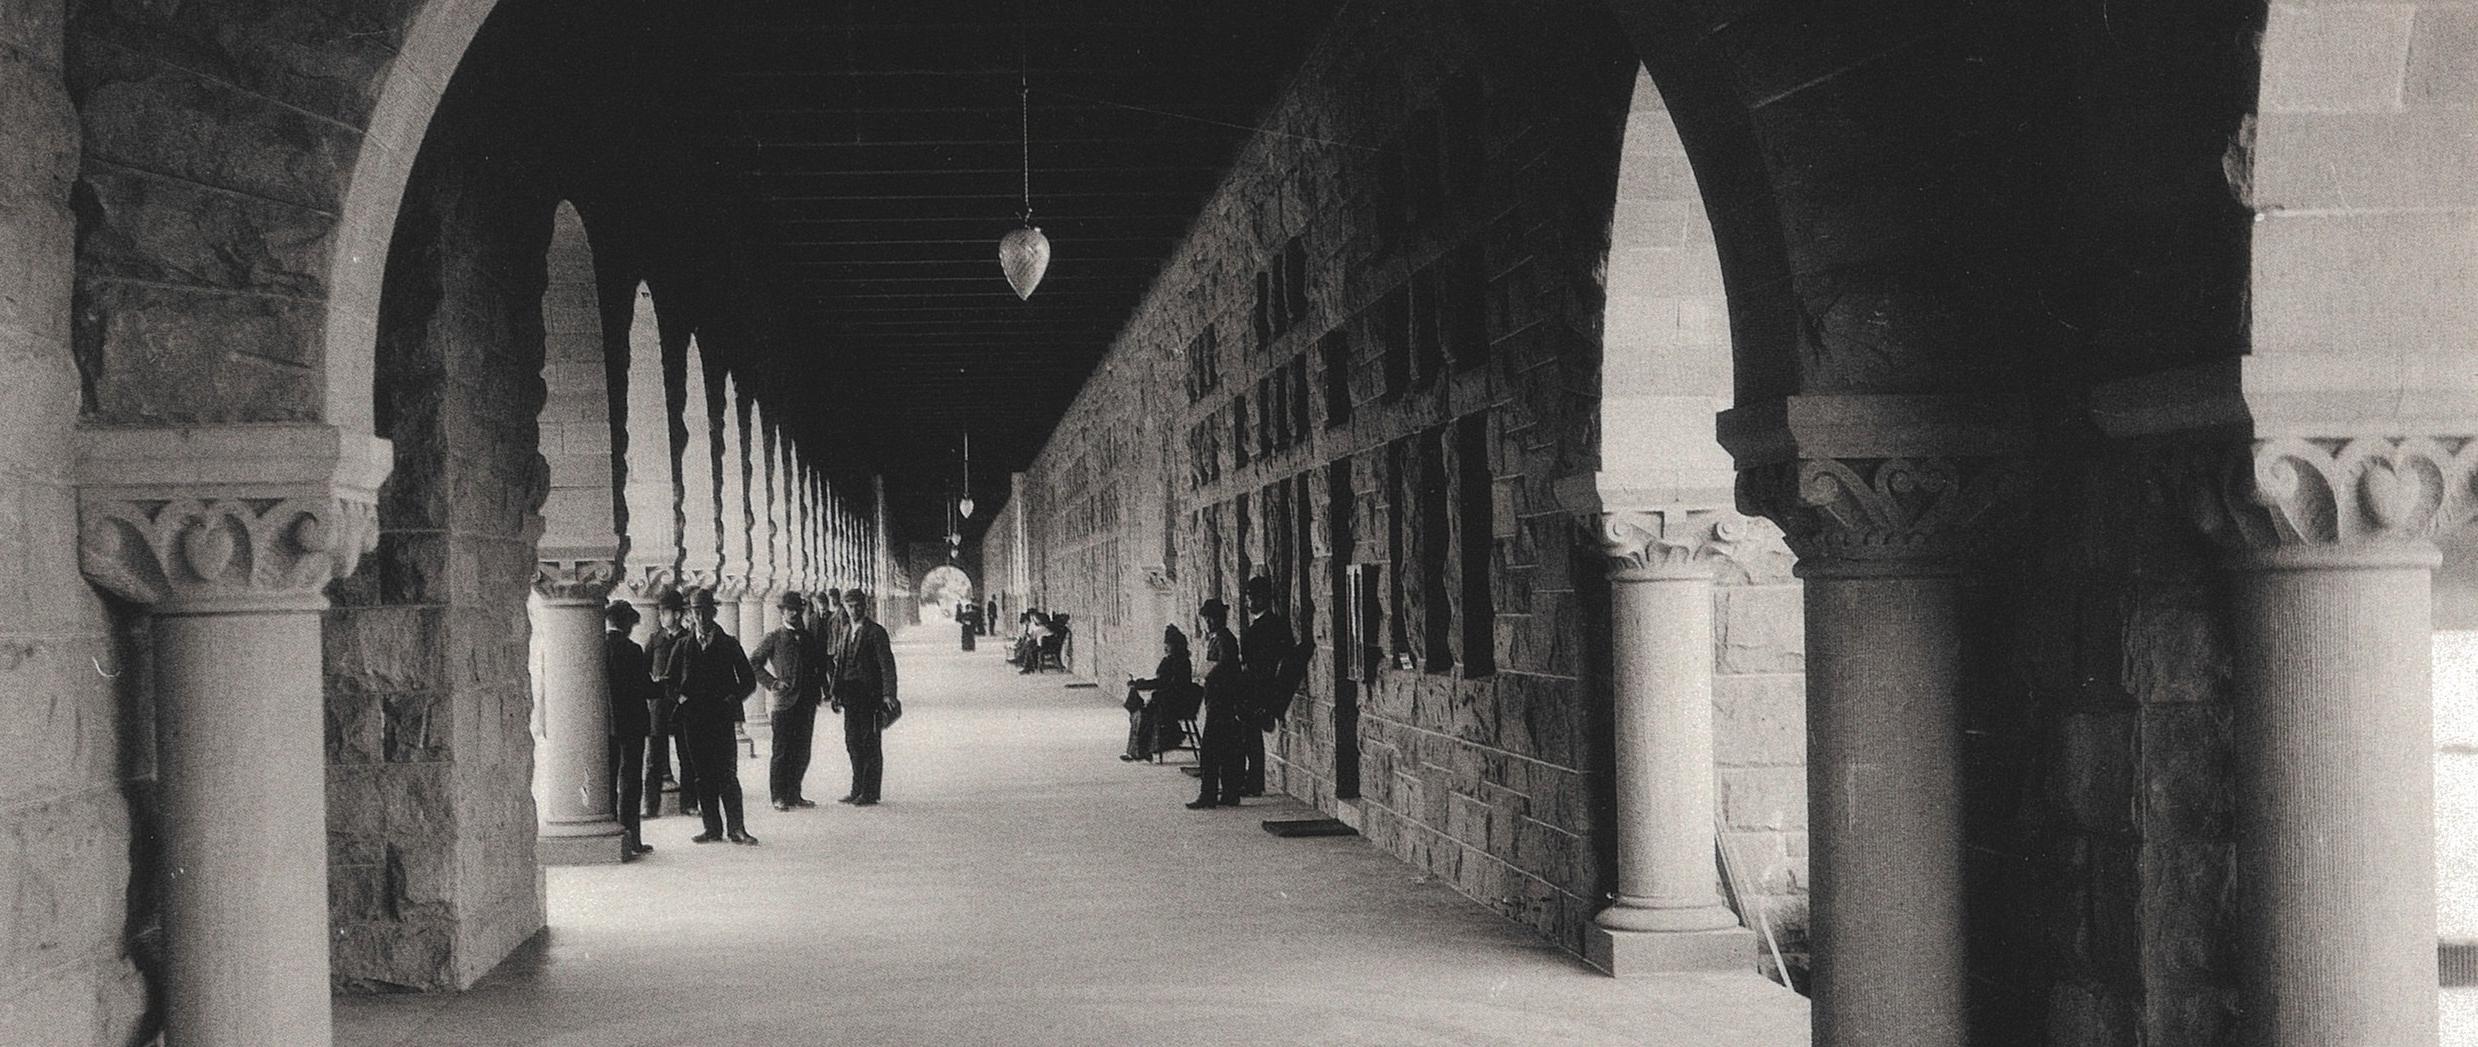 Margo Davis, Roxanne Nilan. The Stanford album: a photographic history, 1885-1945